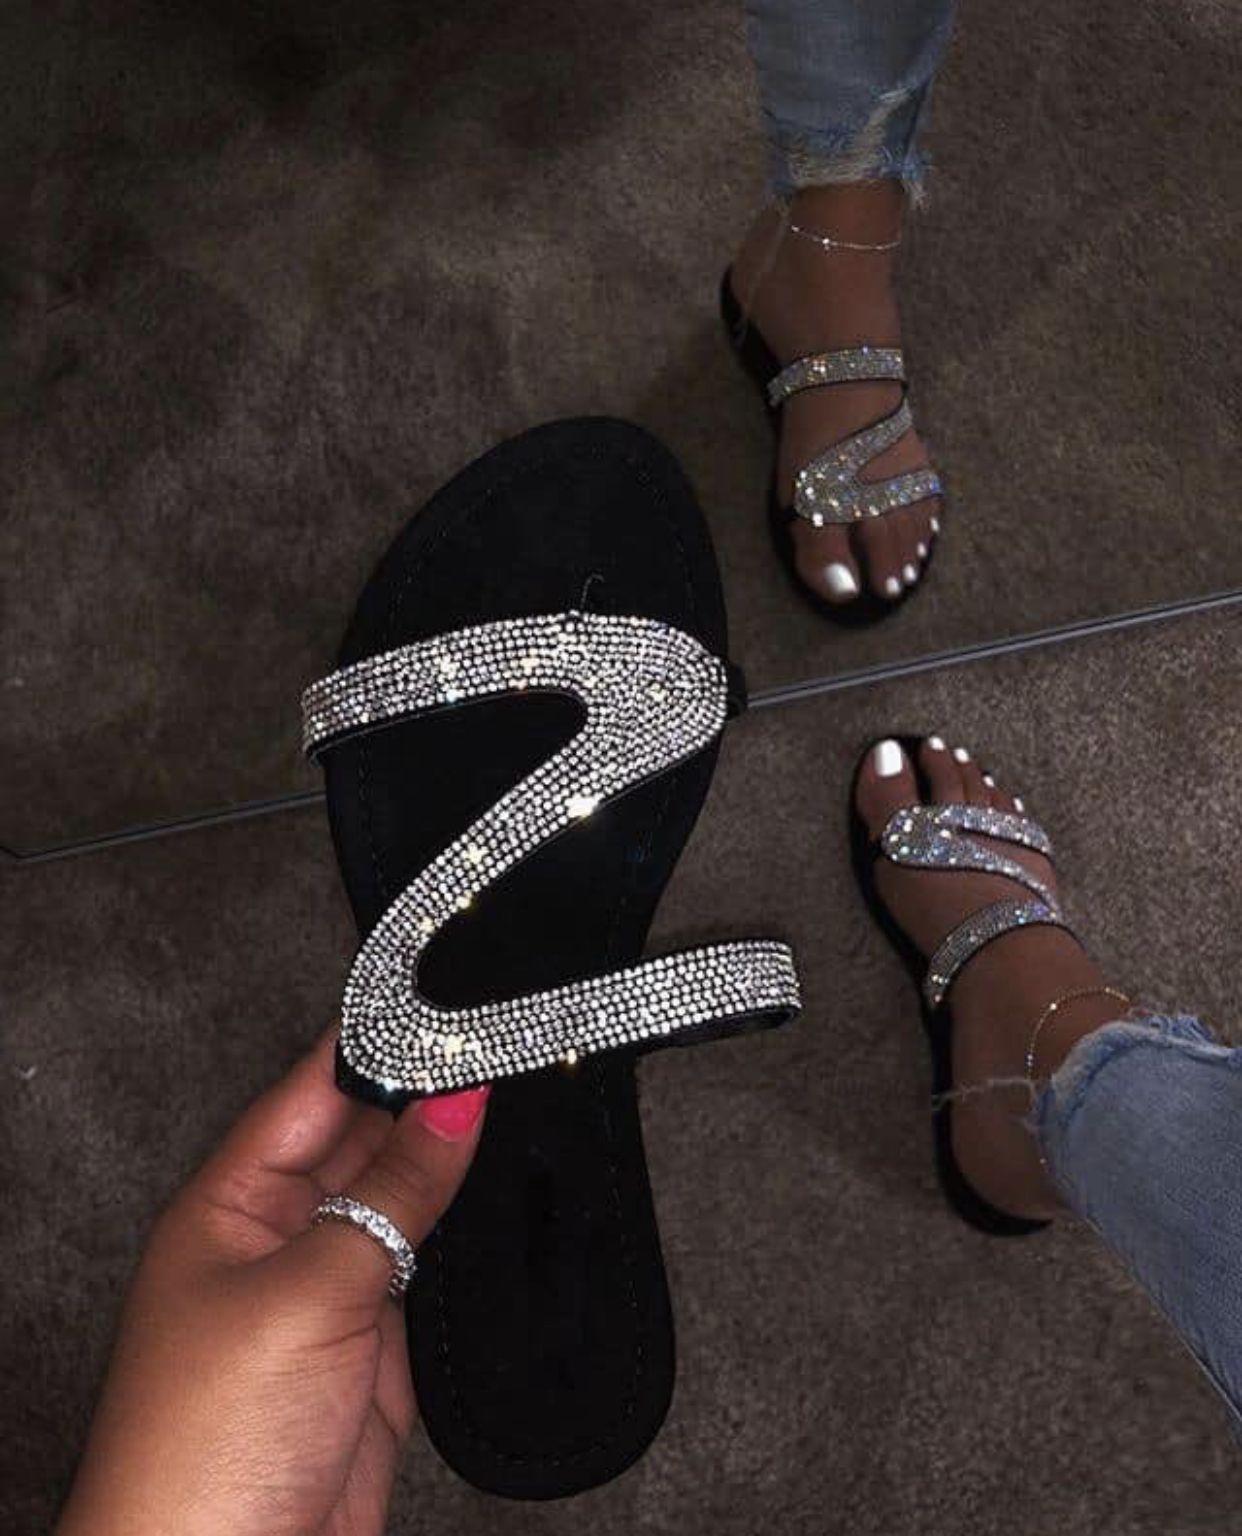 Pin Von Roxana Nejati Auf Shoe Closet Tolle Schuhe Schuhe Frauenschuhe